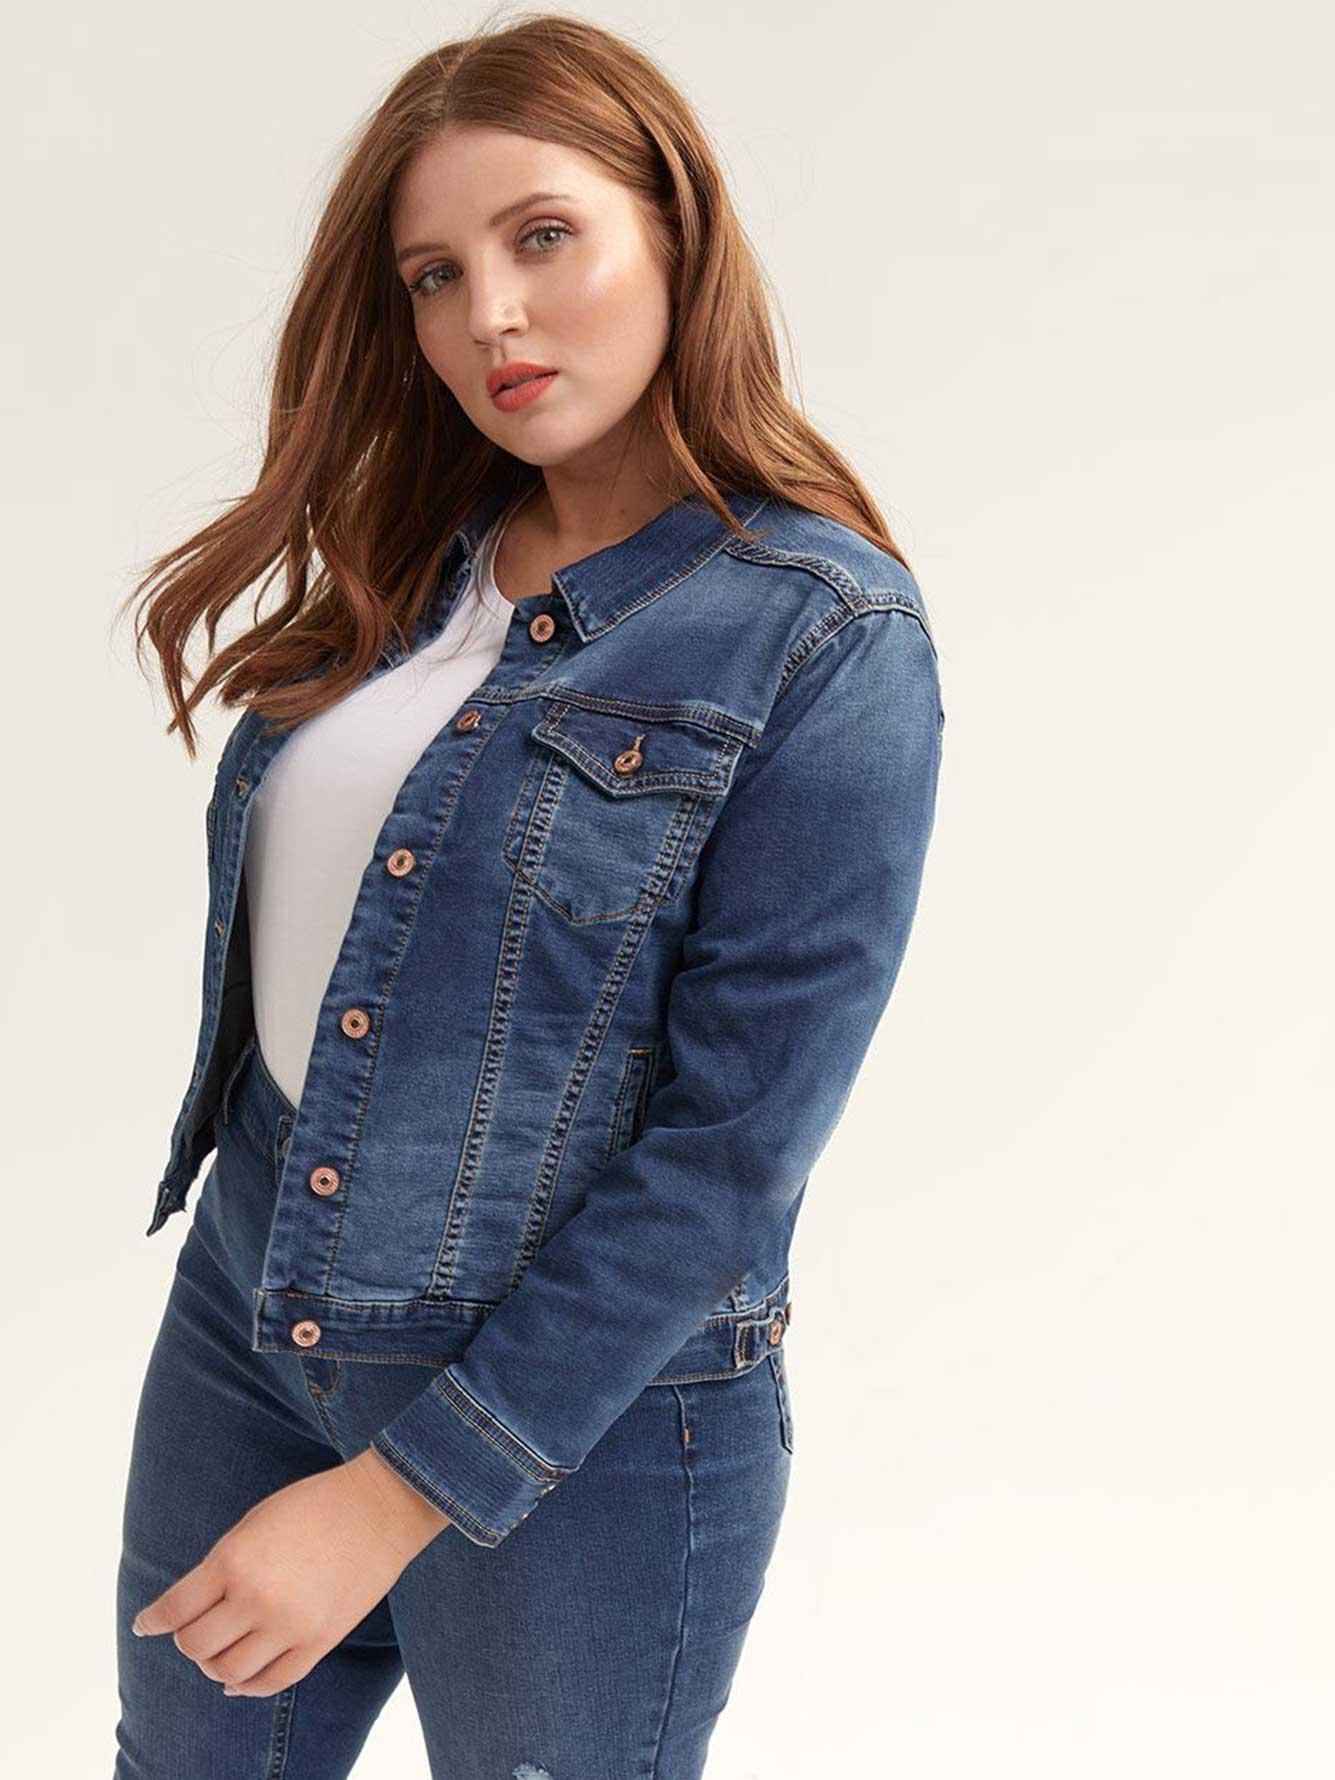 Joga Denim Jacket - Silver Jeans